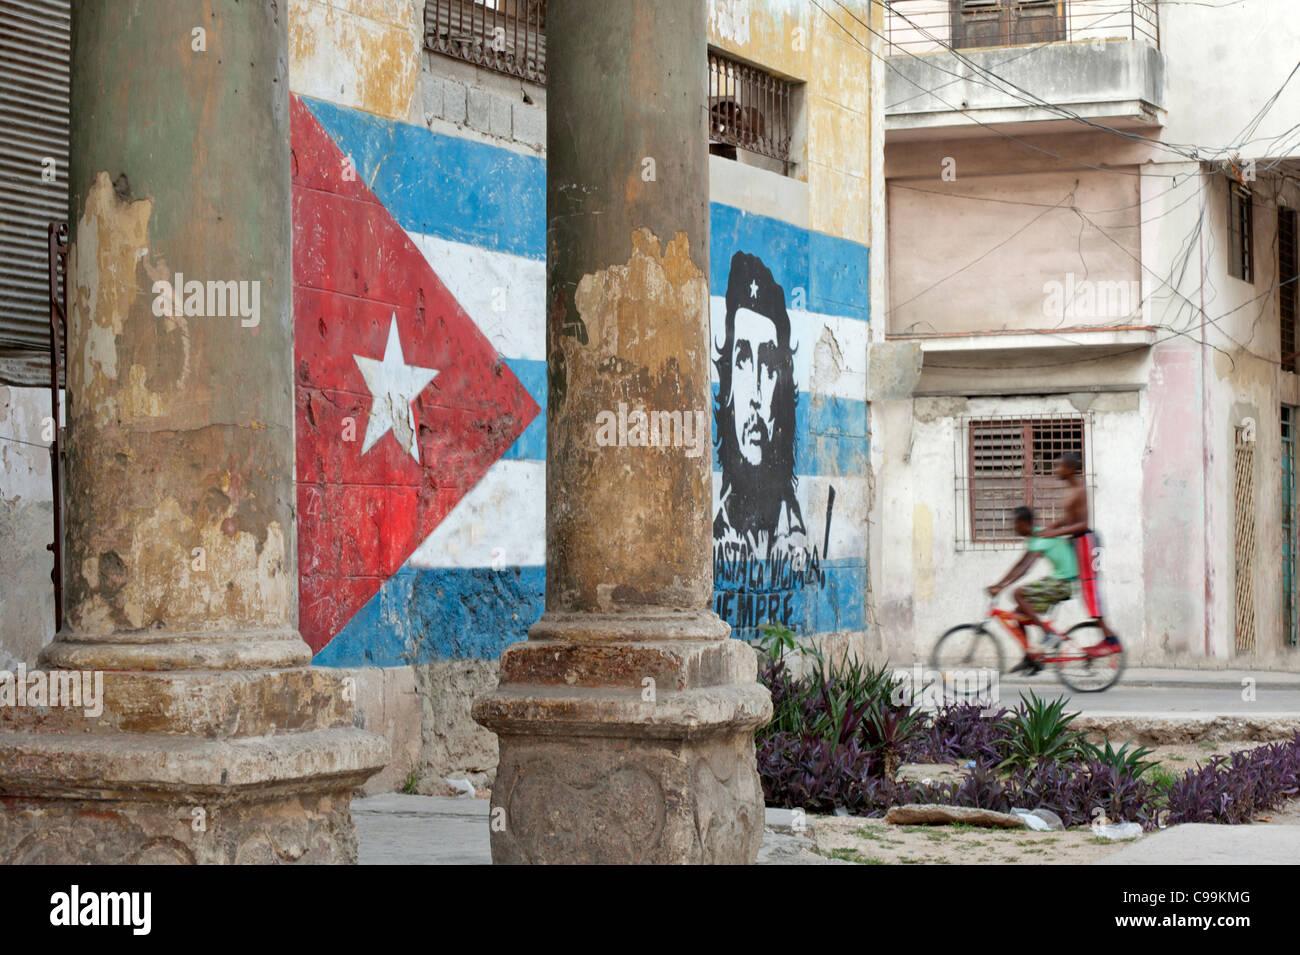 Mural of Cuban flag and Che Guevara Old Havana Cuba - Stock Image